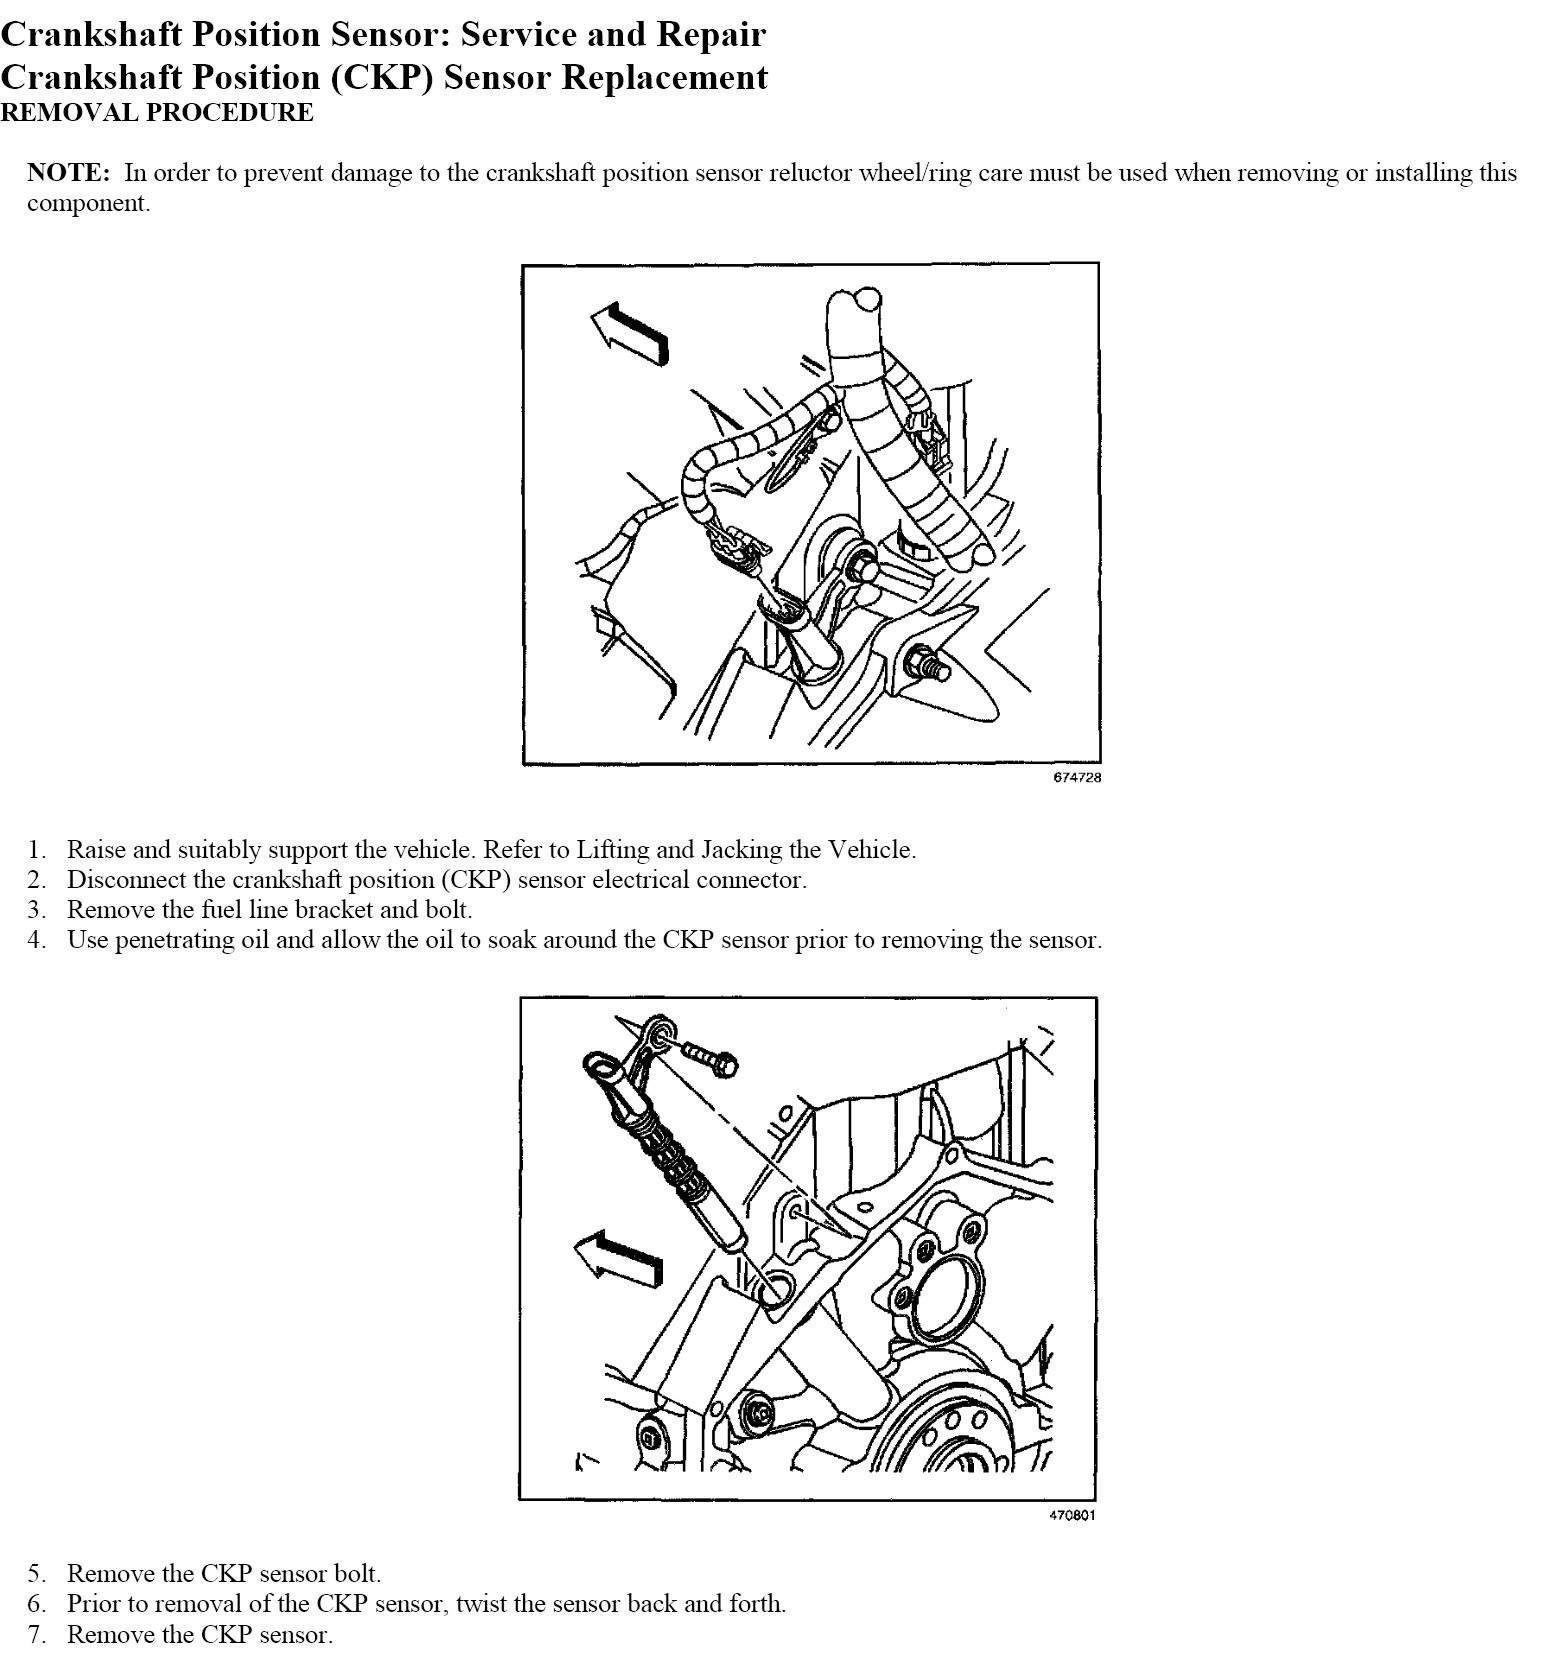 Snap Chevy Tahoe Crankshaft Position Sensor Wiring Diagram Get Free 4 3 Vortec Image About 8 1 Crank Location